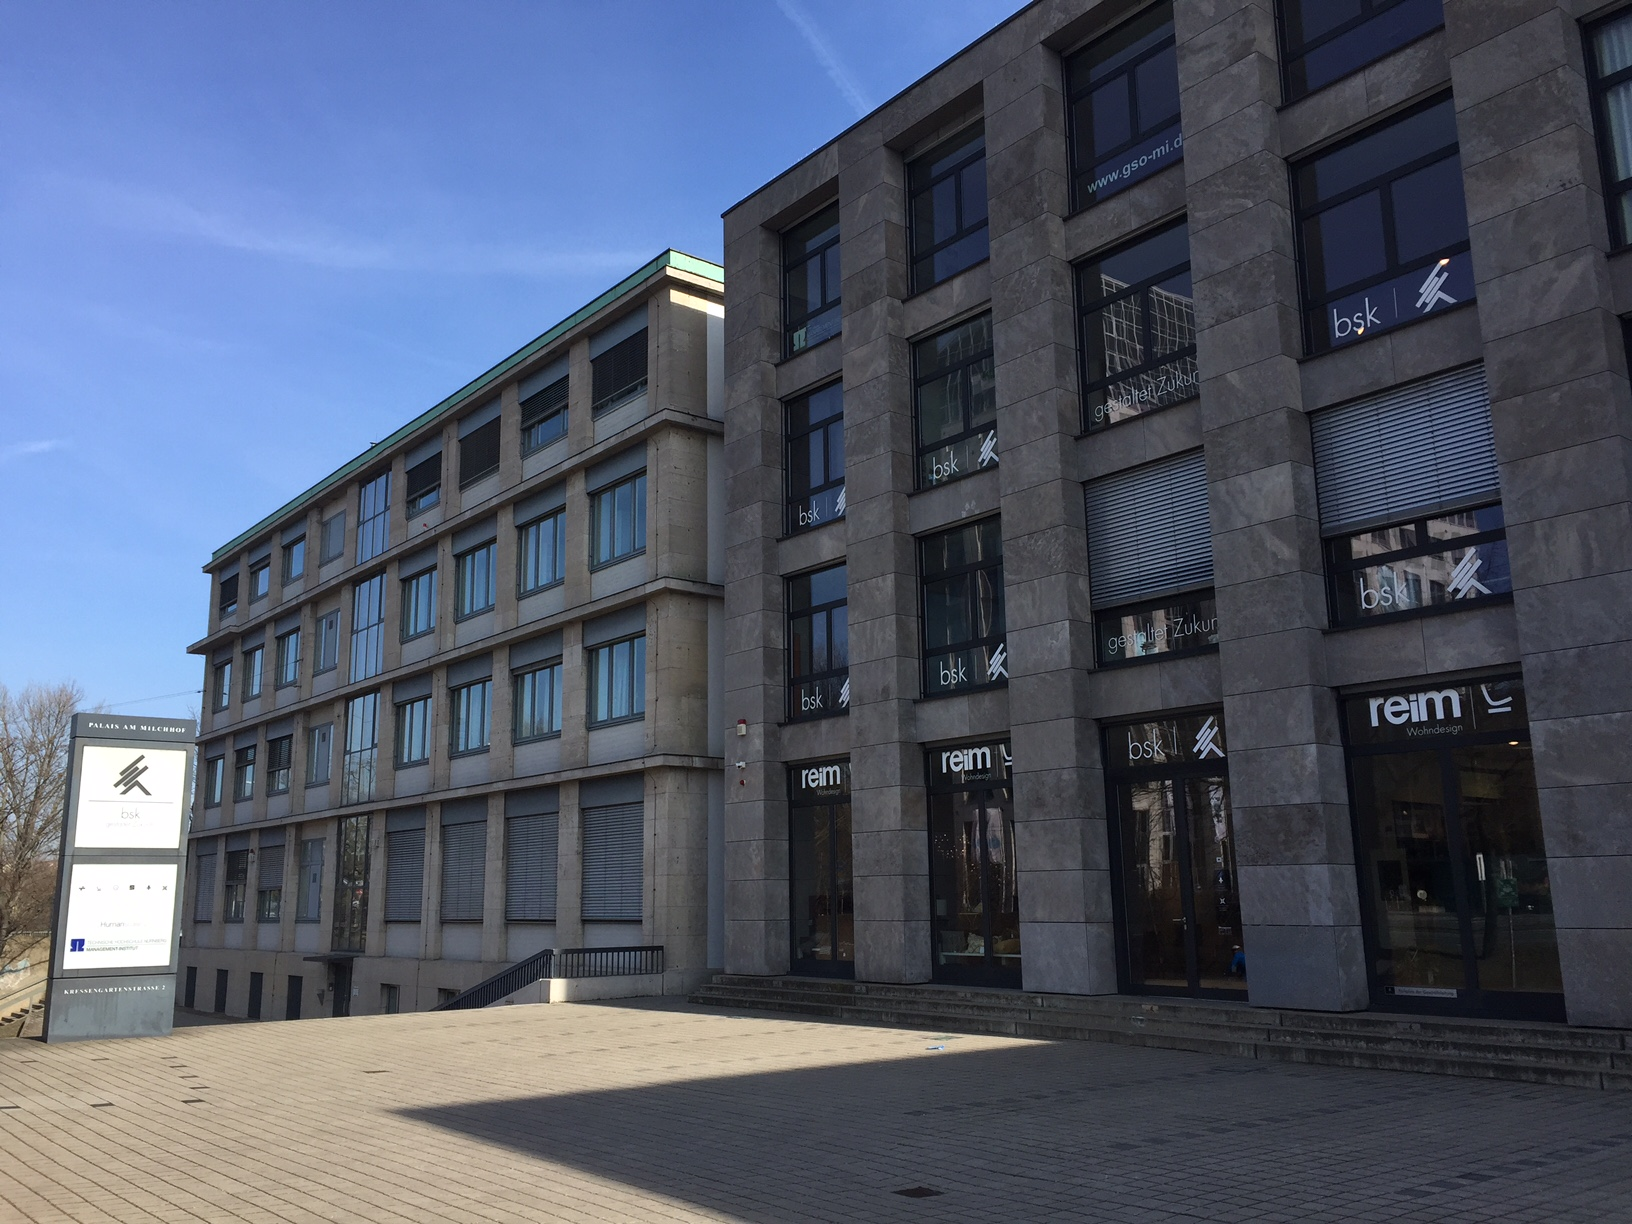 bsk büro + designhaus GmbH